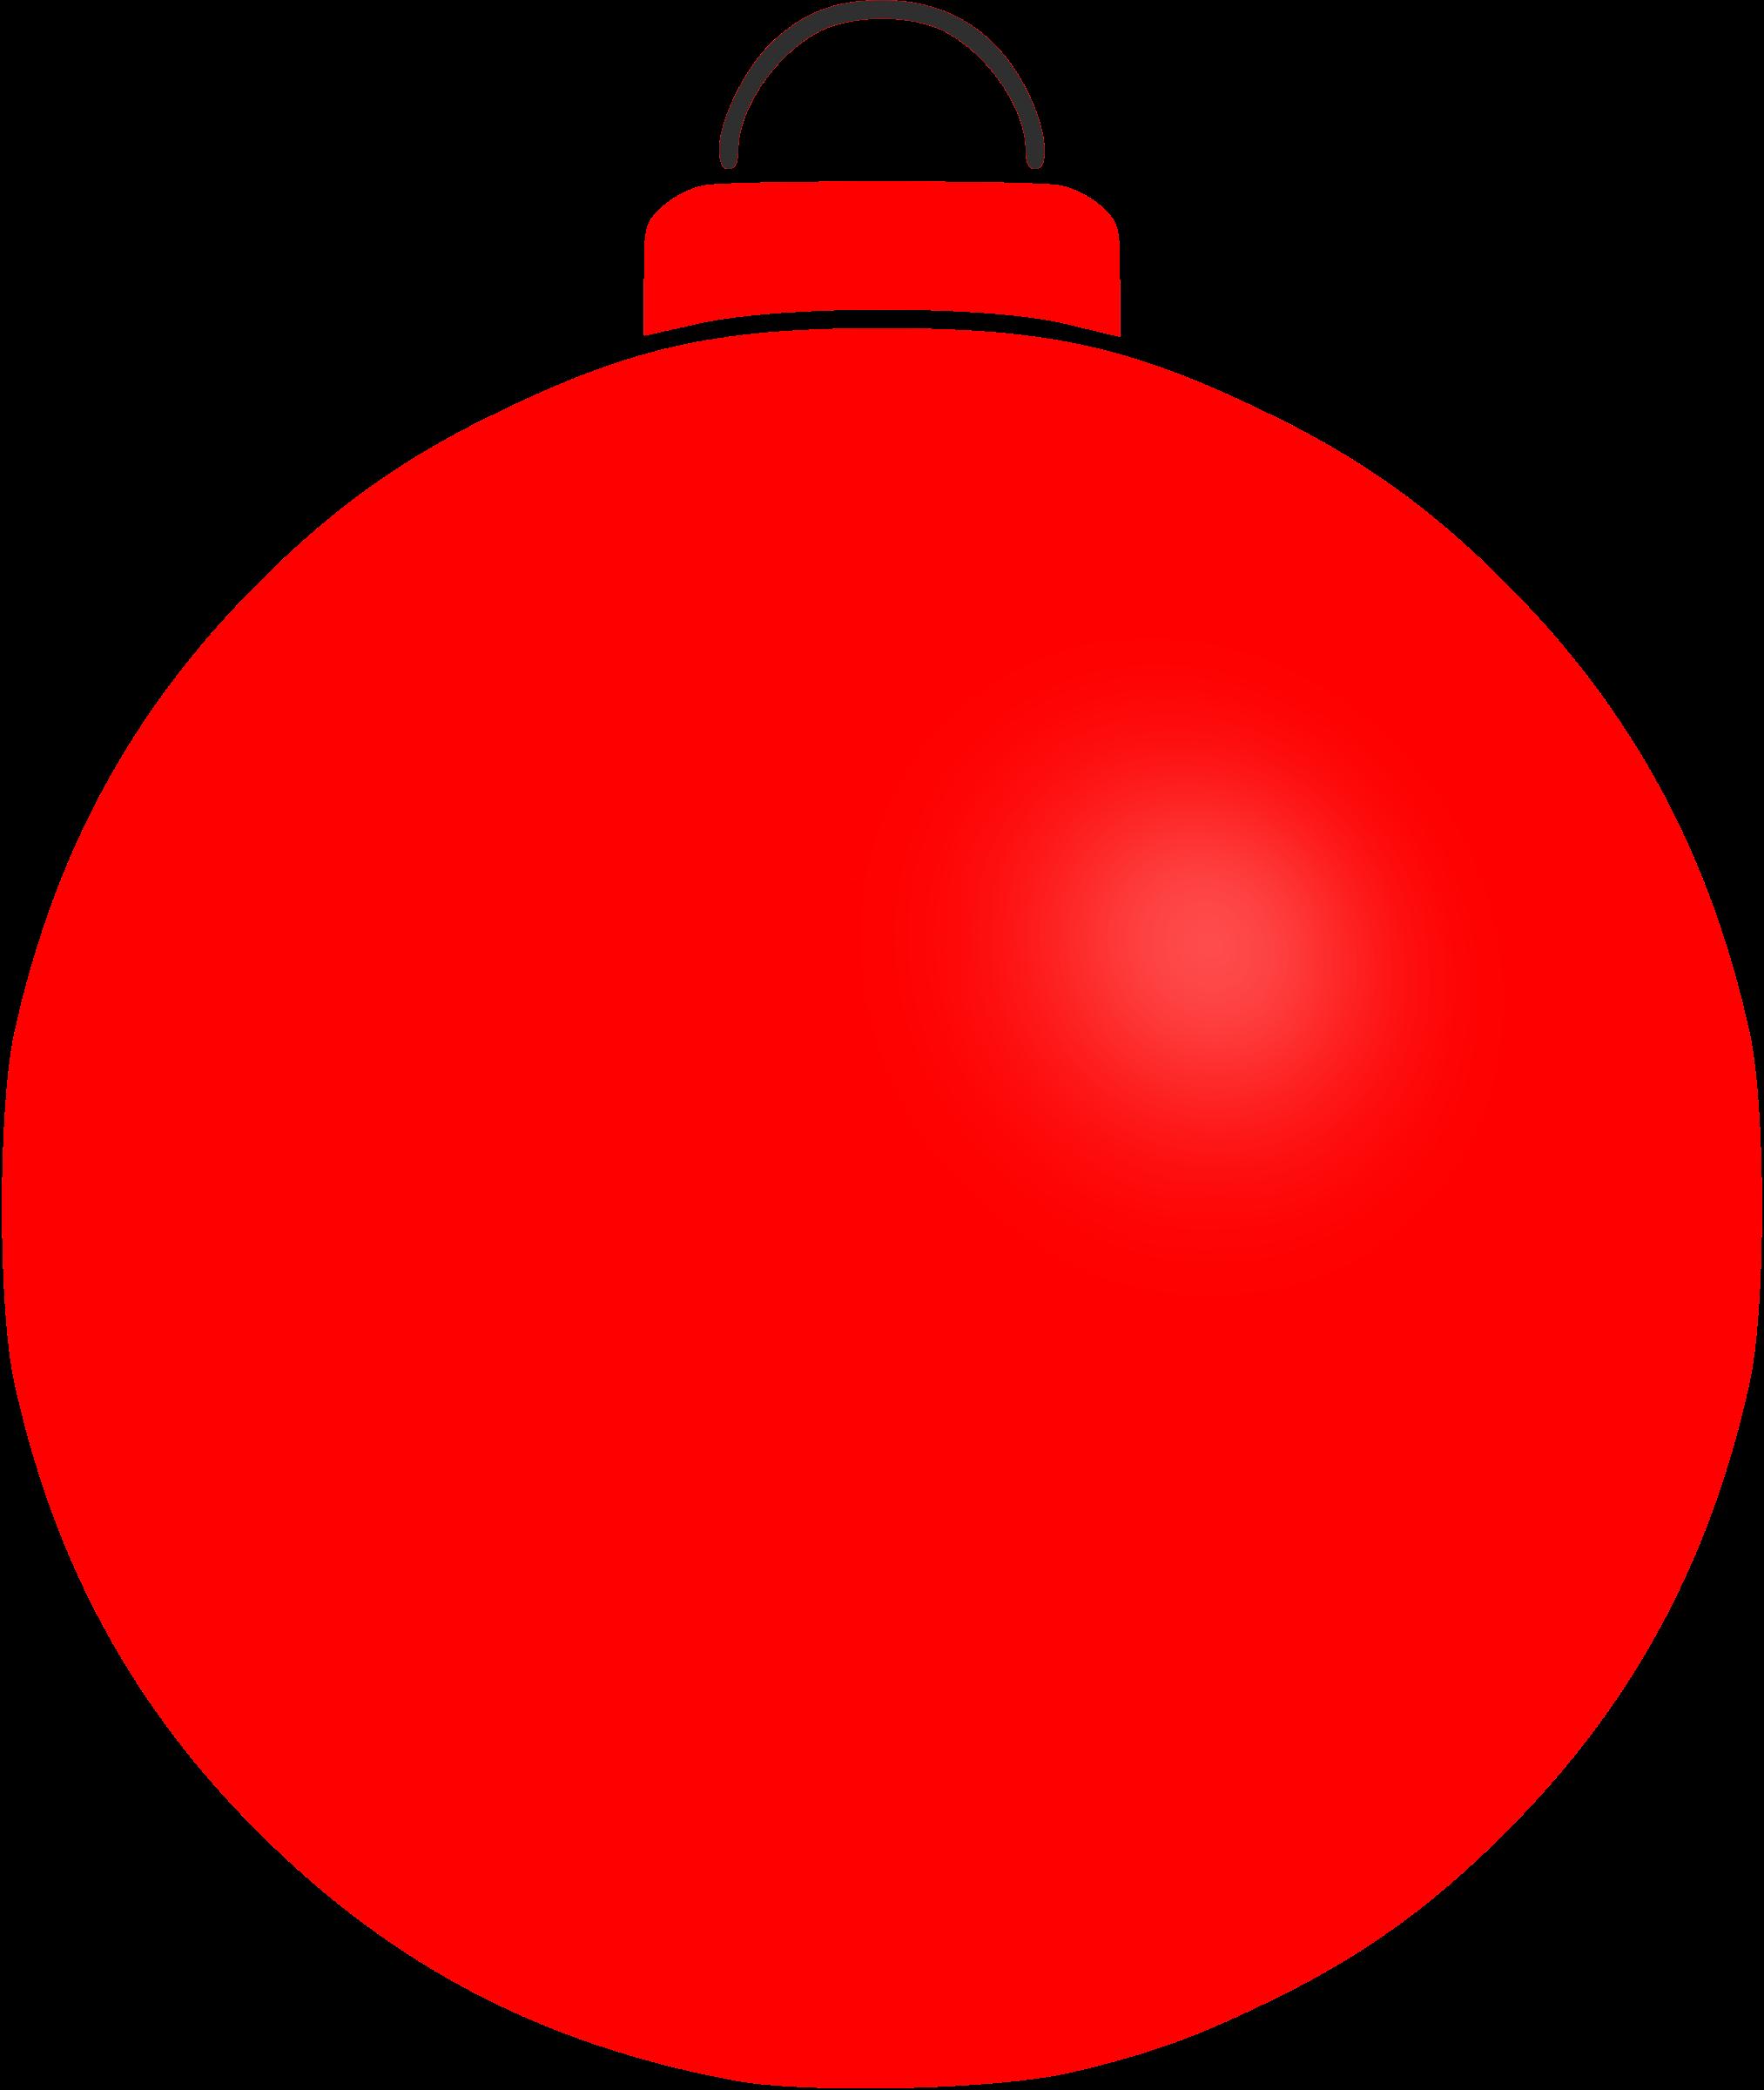 Christmas ornament clipart clip art royalty free download Christmas Ornament Clipart | jokingart.com clip art royalty free download